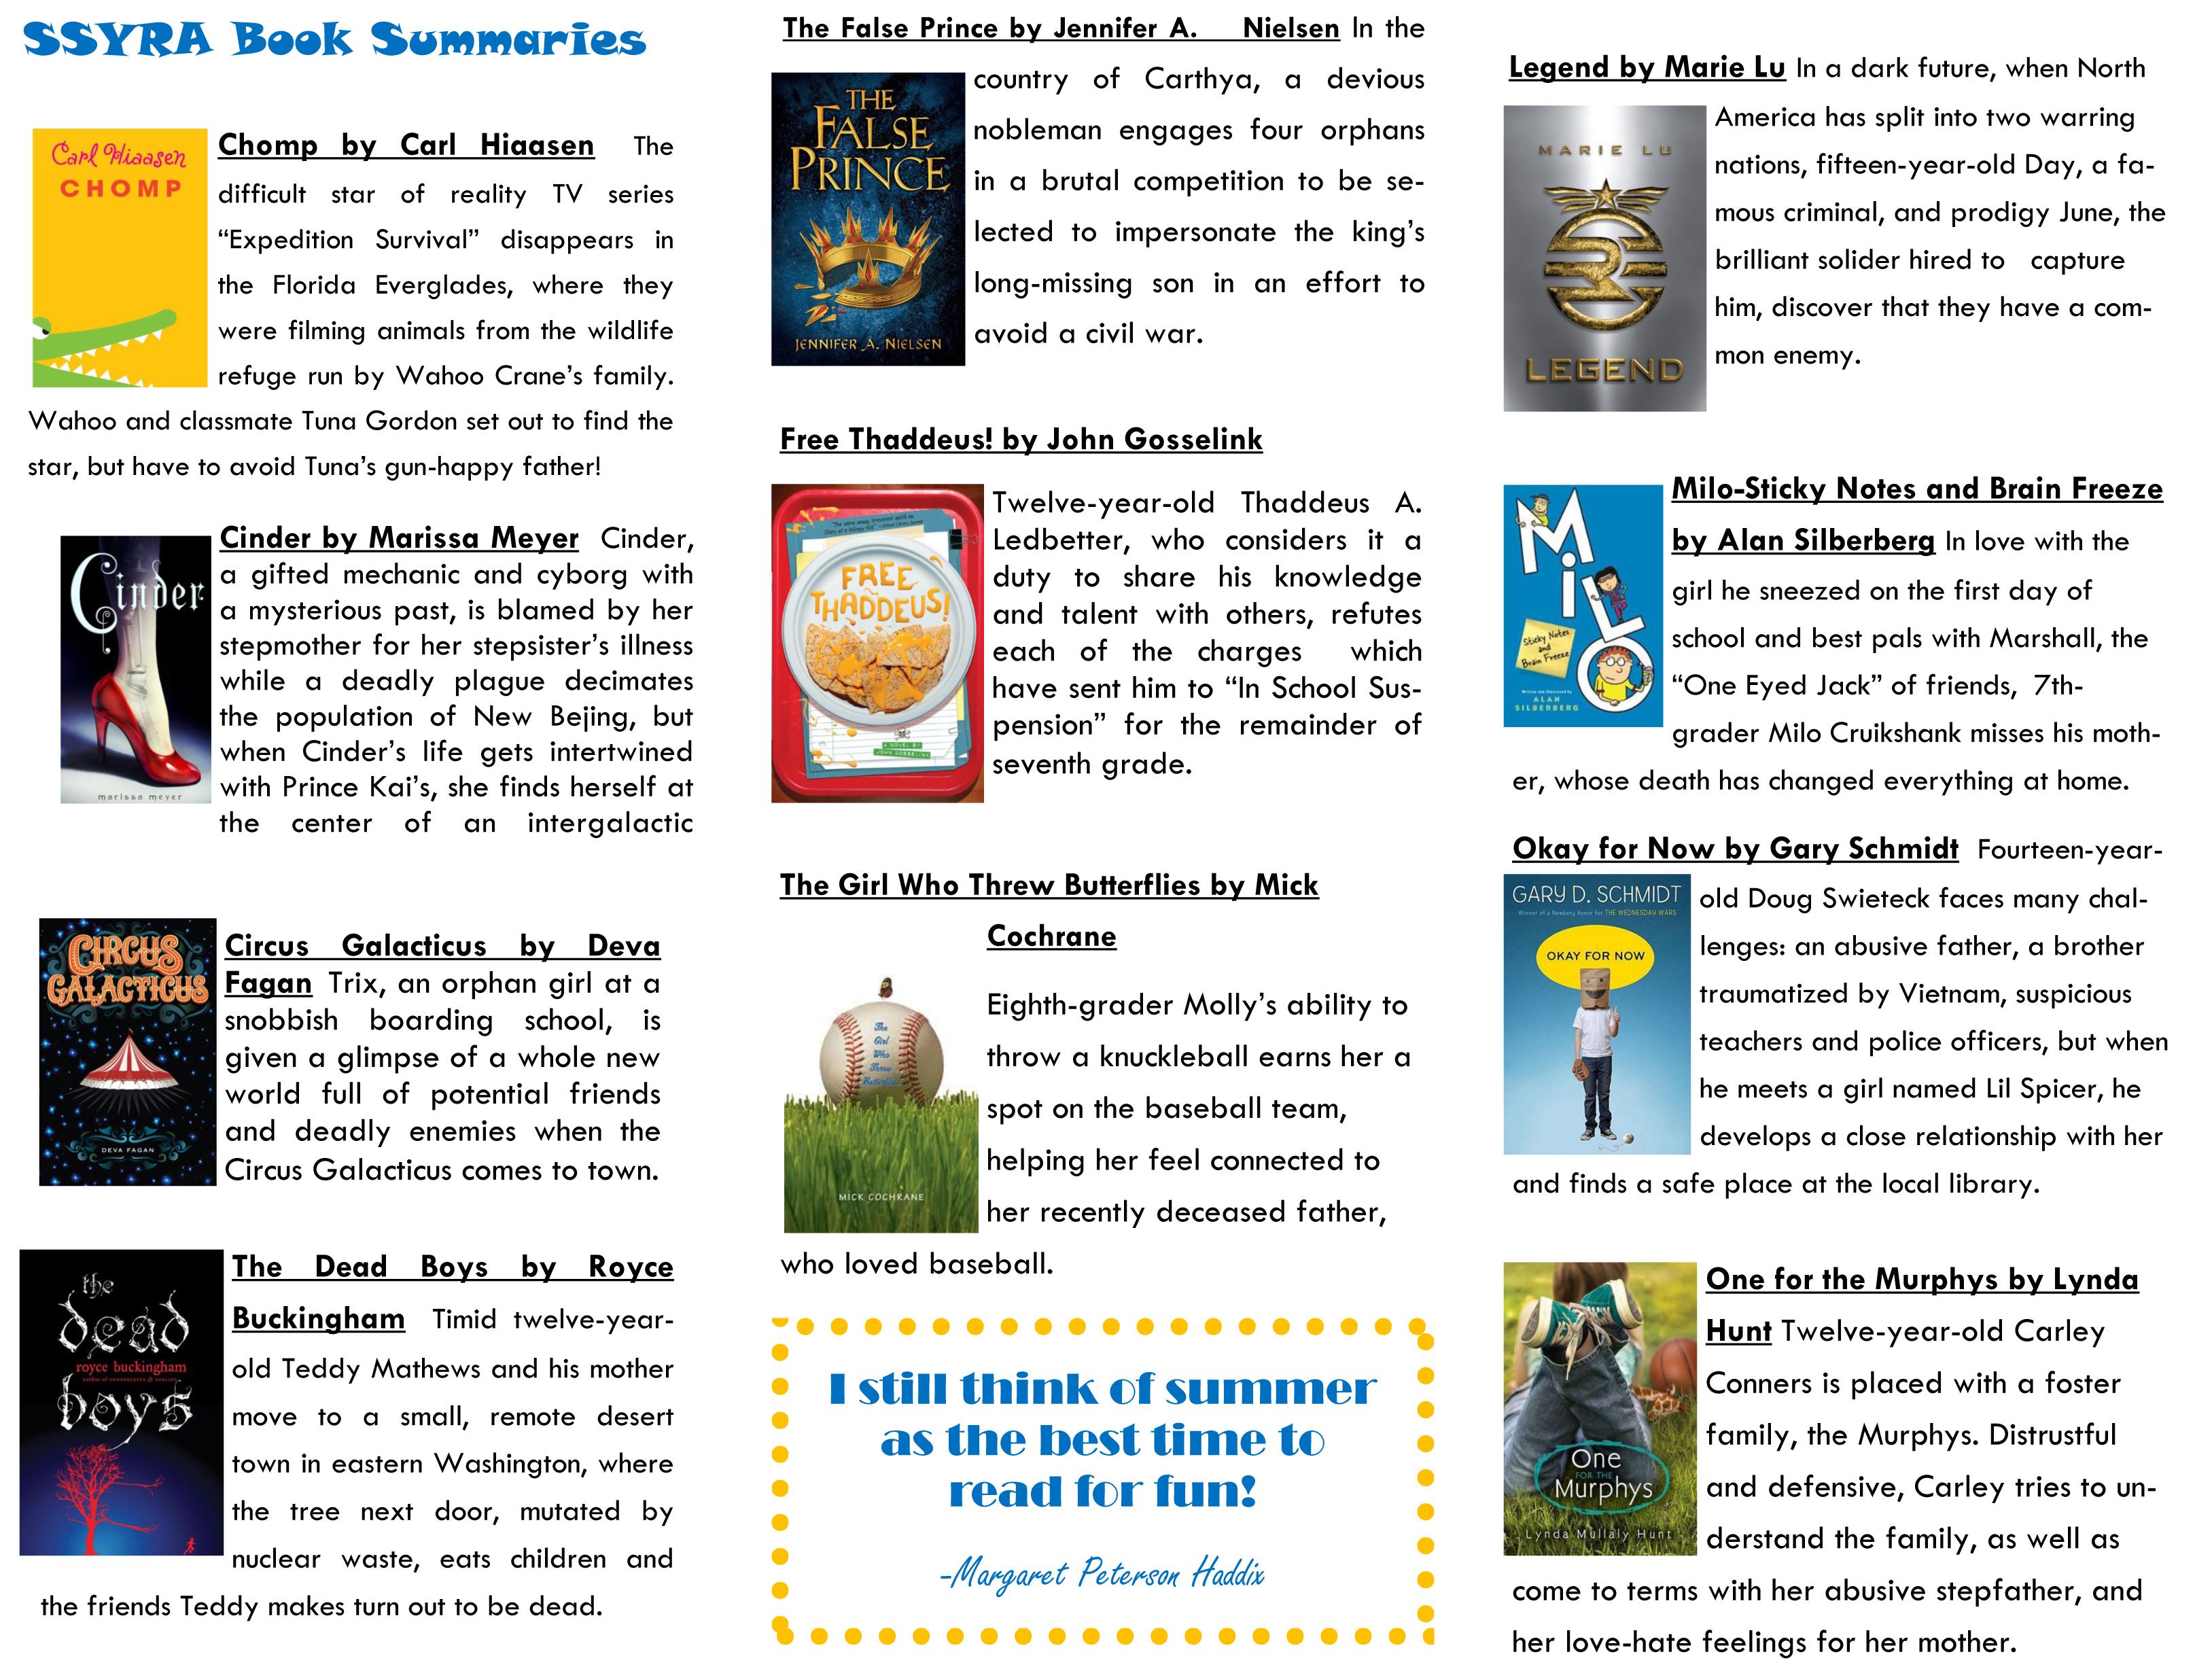 SSYR brochure 2013-2